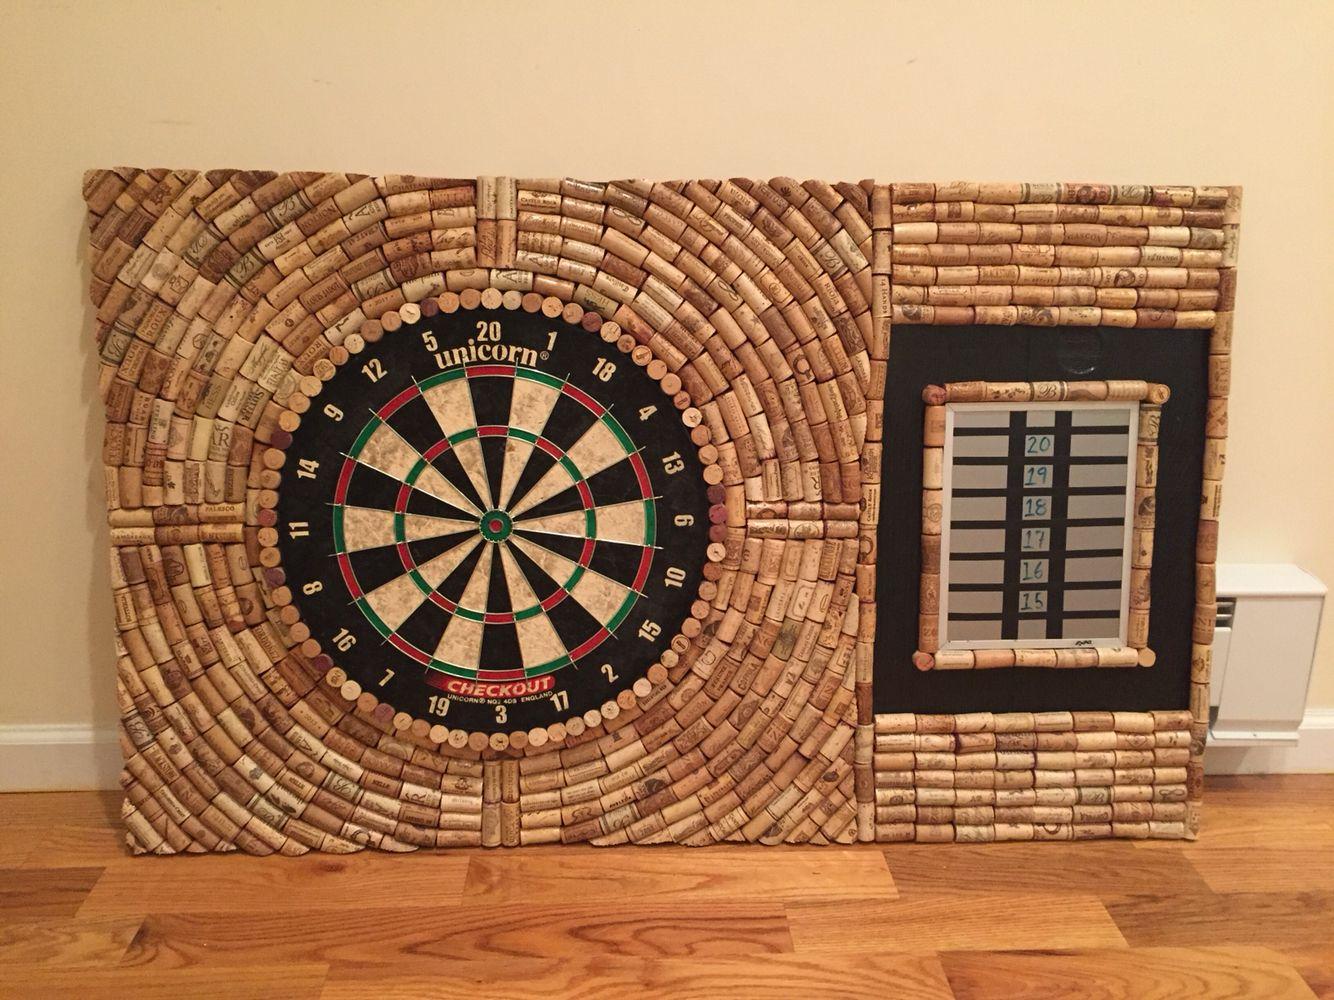 dart cork board made out of wine corks arts and crafts pinterest cork boards darts and cork. Black Bedroom Furniture Sets. Home Design Ideas